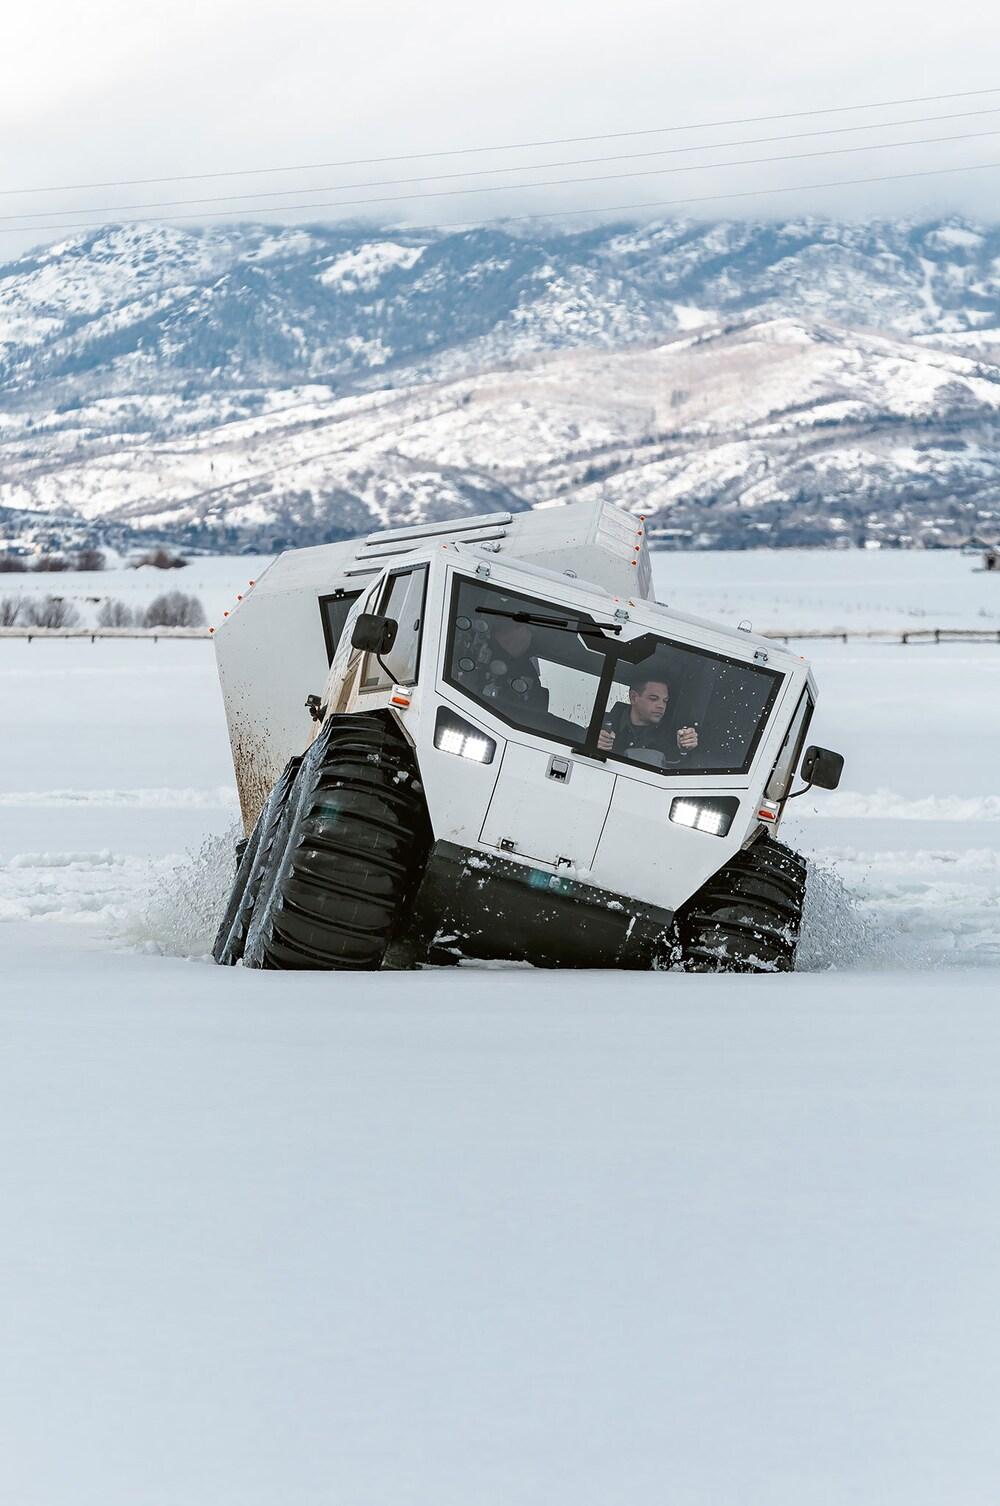 014 sherp the ark 3400 top gear america overland atv 1